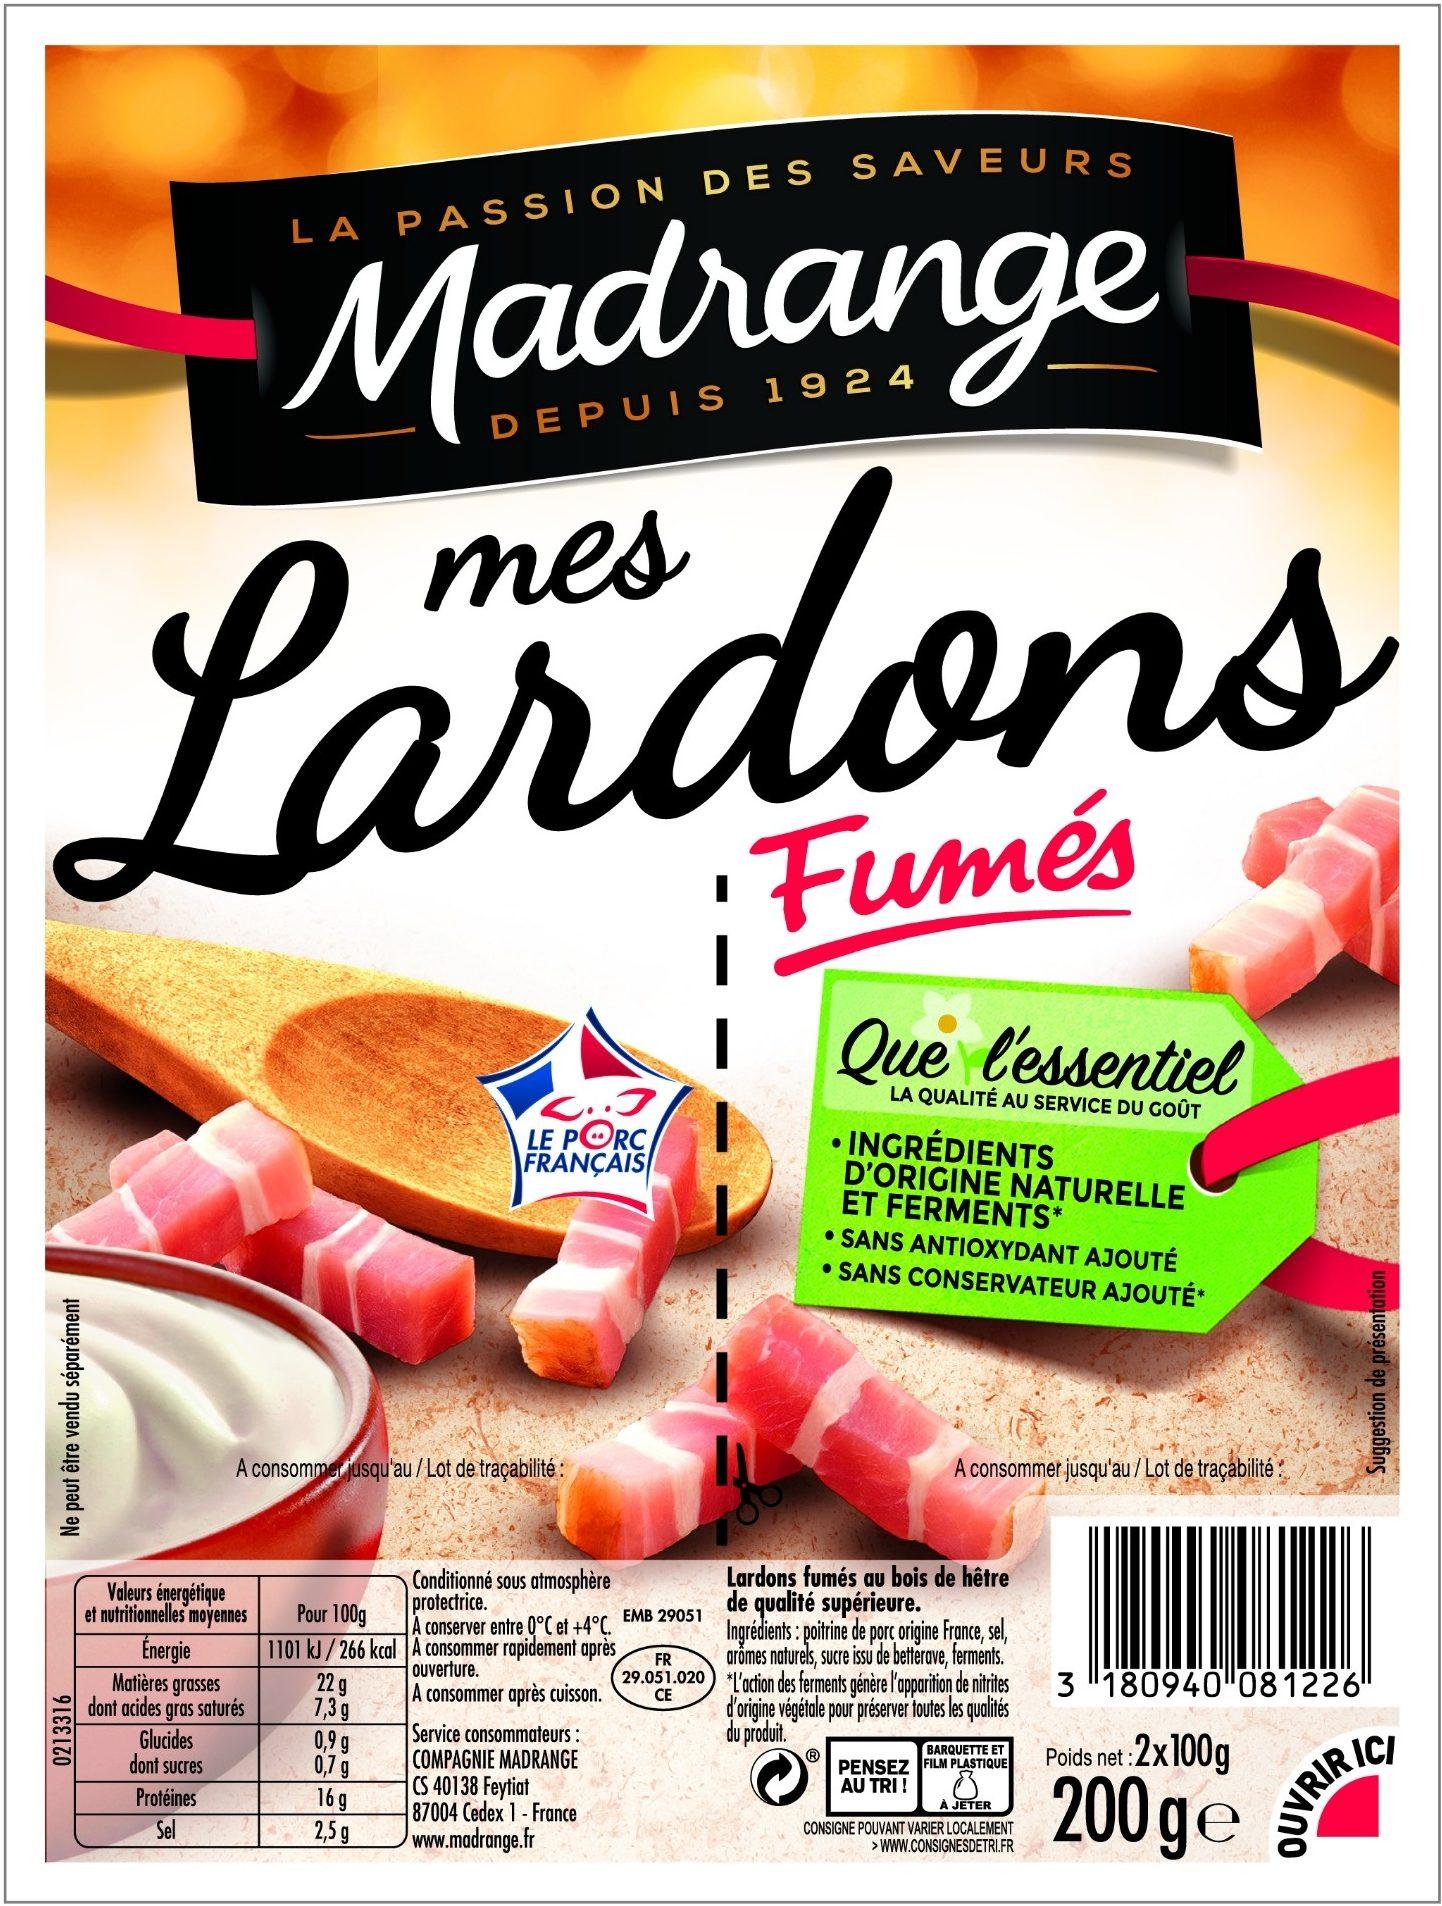 La Compagnie Du Hetre mes lardons fumés vpf - madrange - 200 g (2 x 100 g)